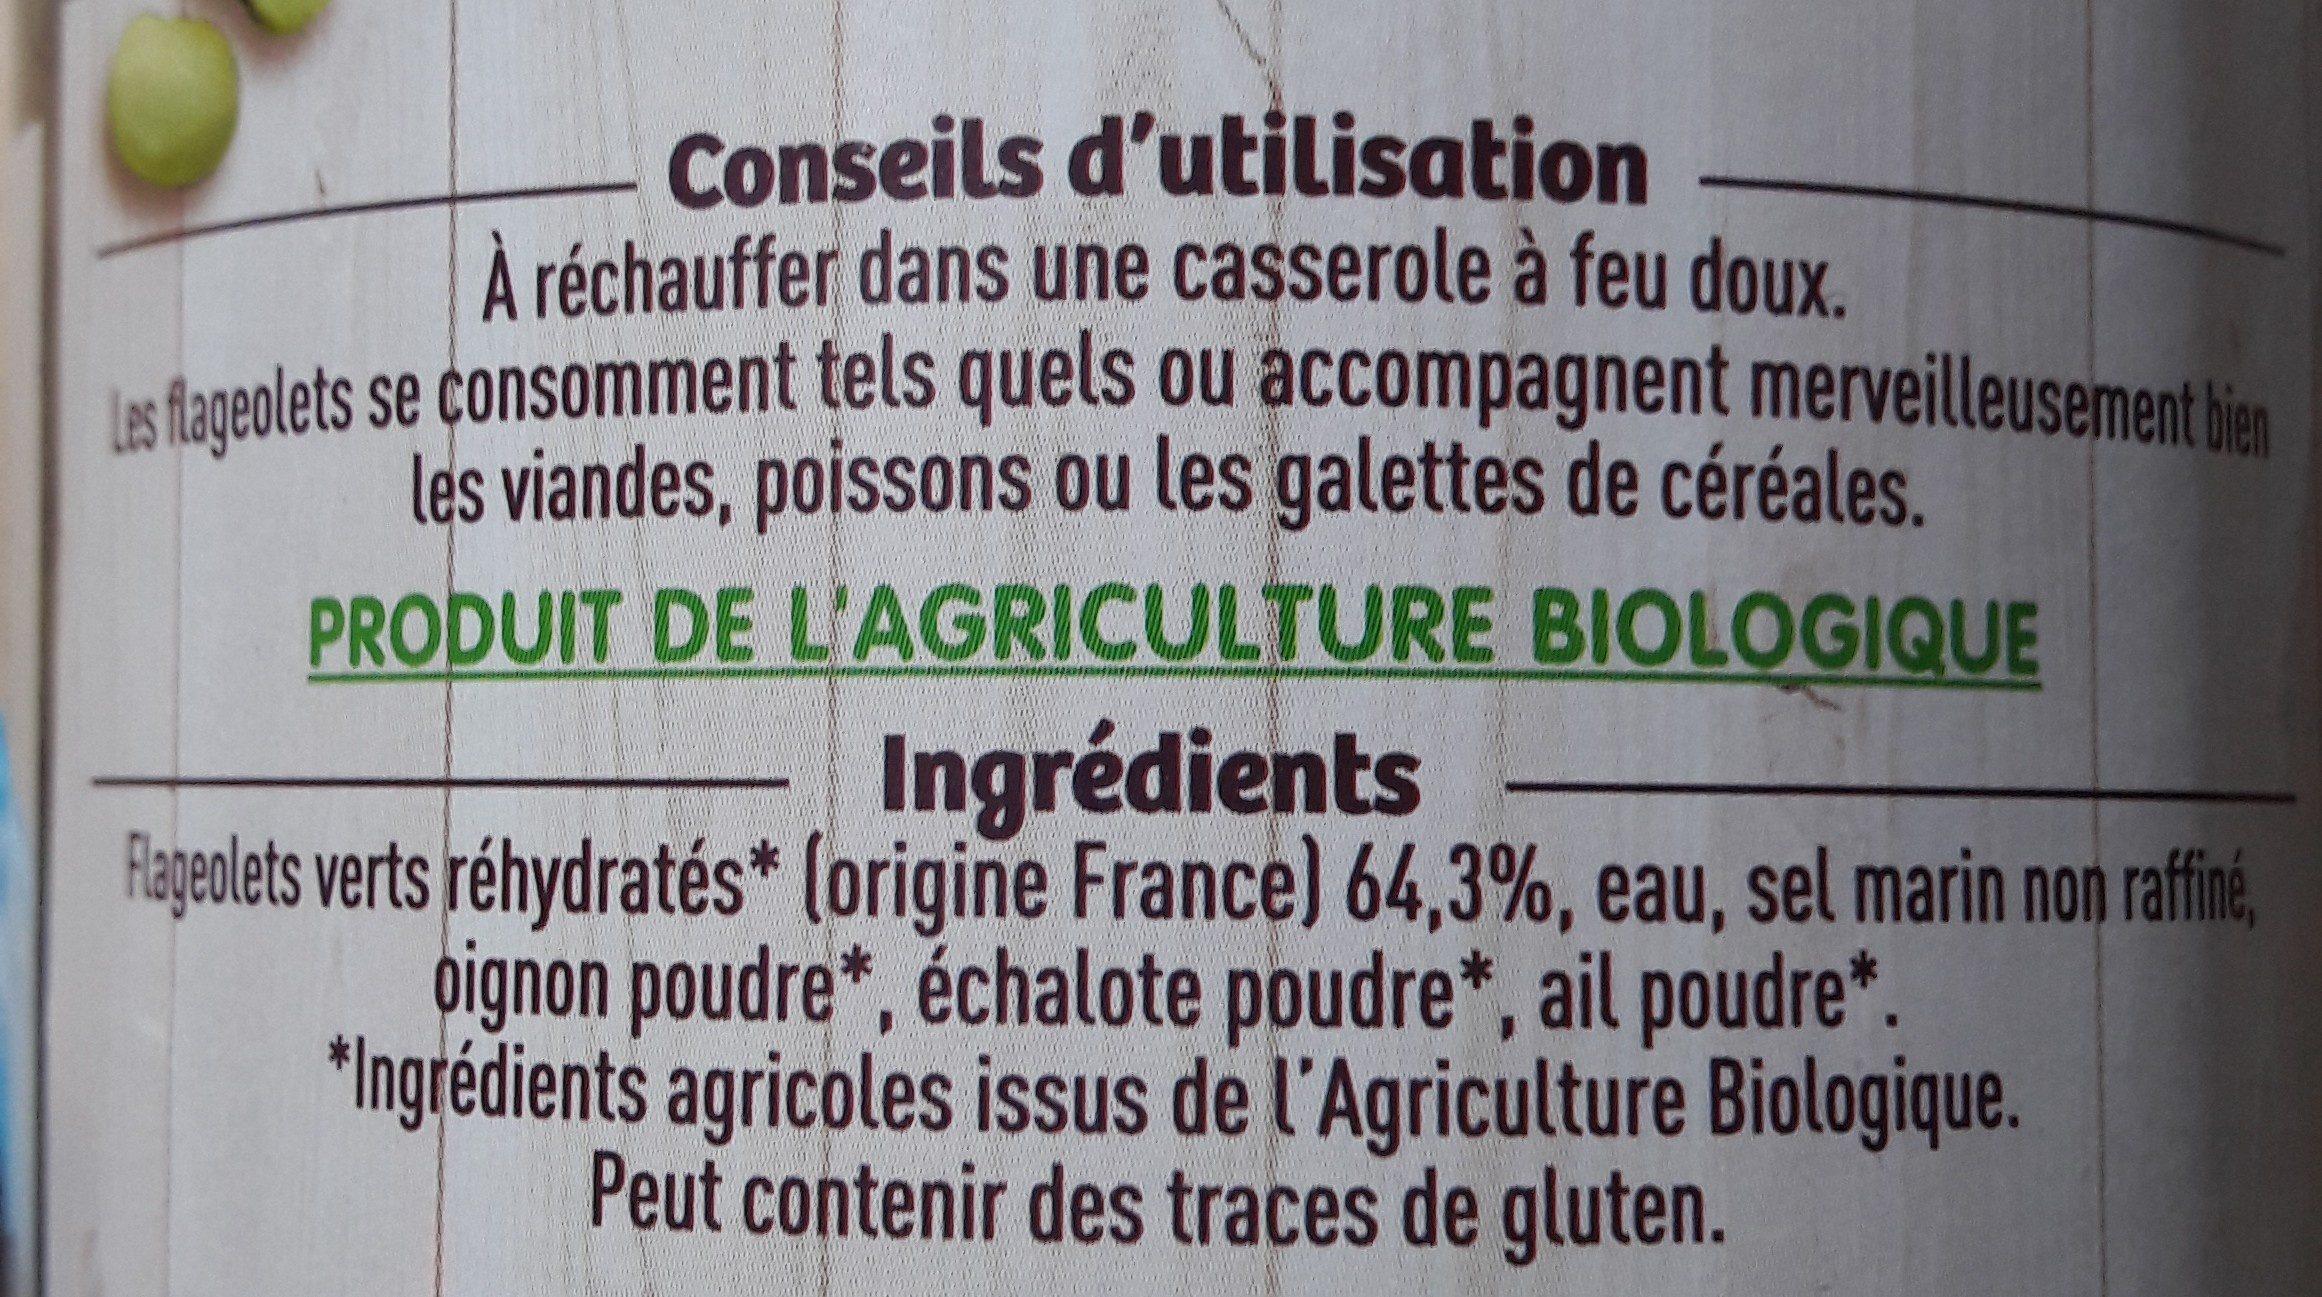 Flageolets 72cl 4€35 - Ingredients